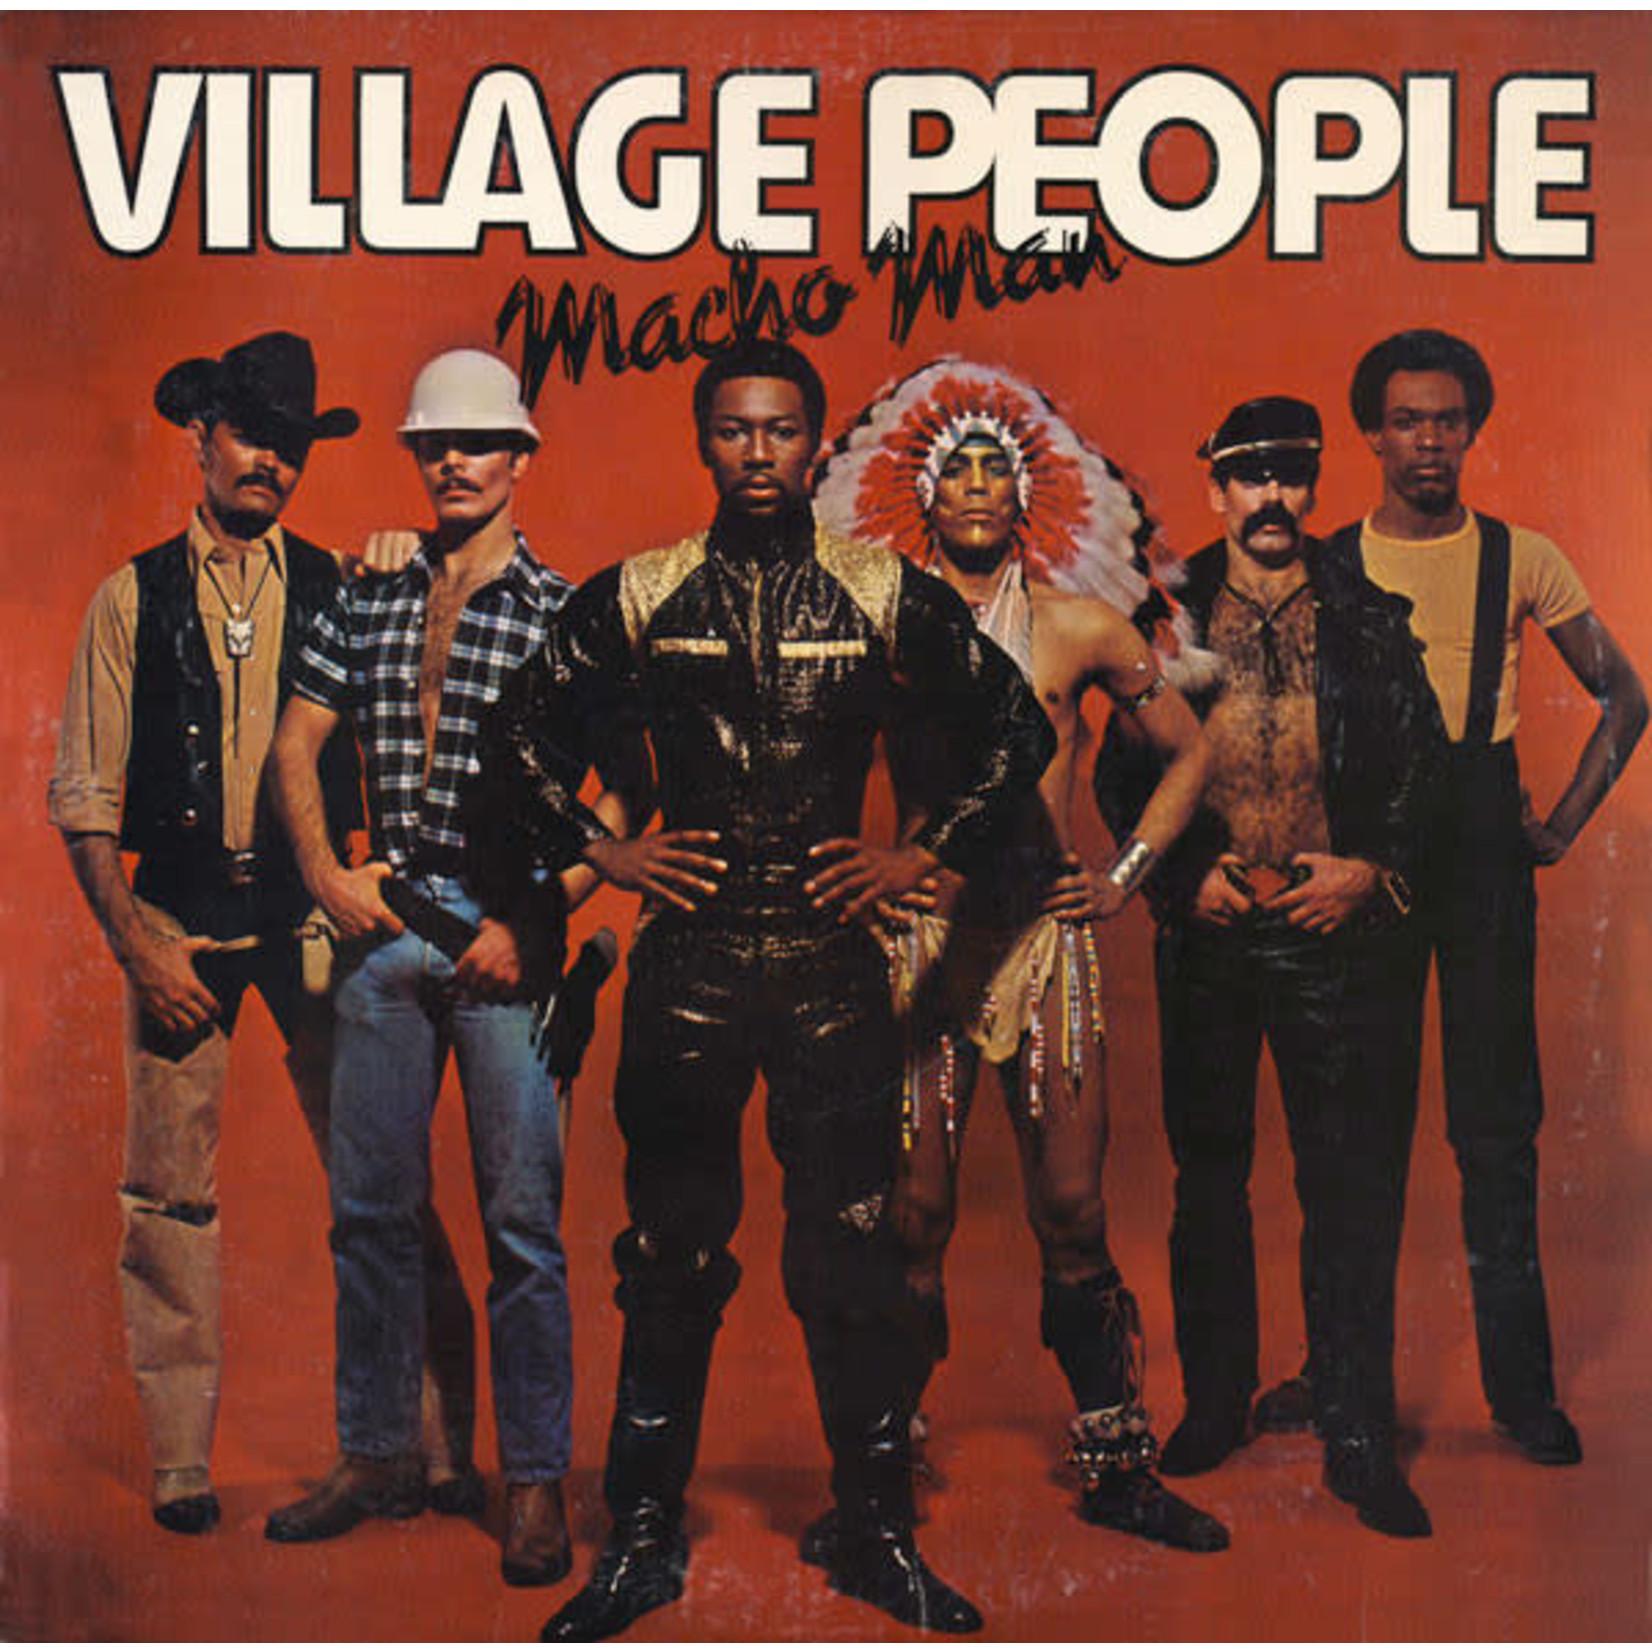 [Vintage] Village People: Macho Man